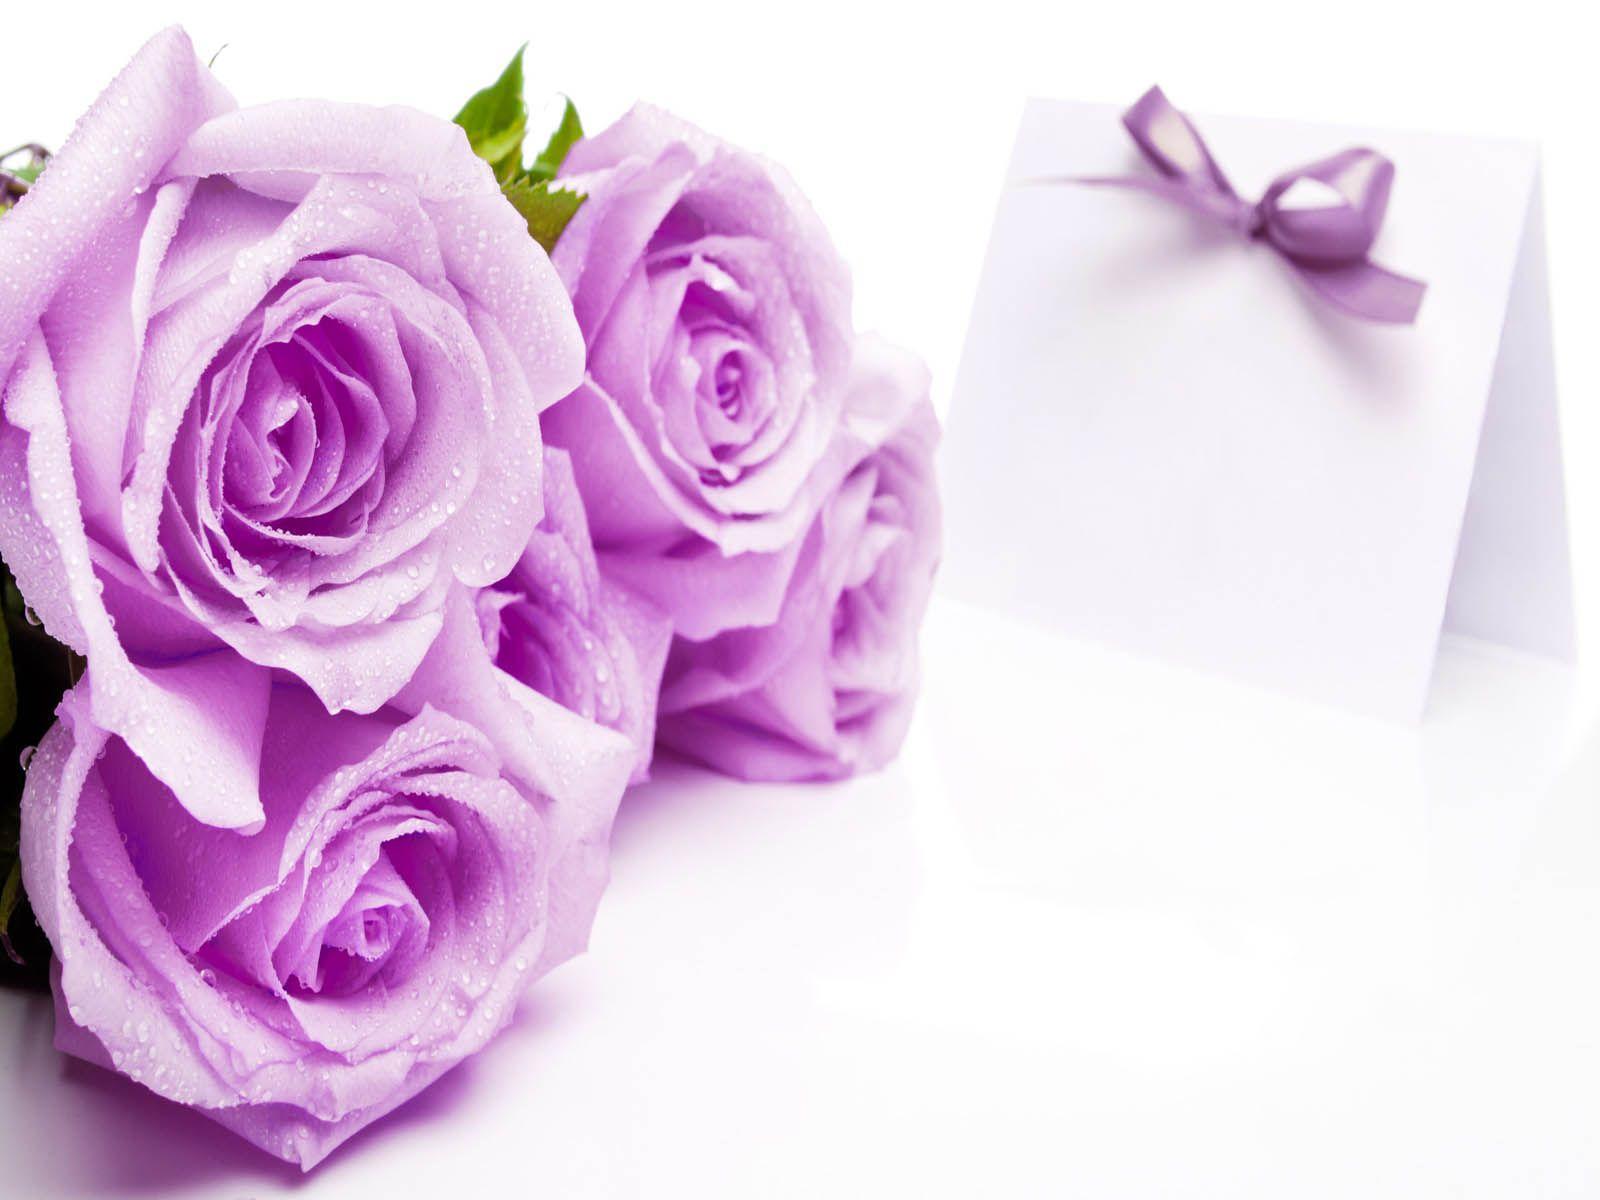 Rose Flowers Hd Wallpapers Wallpaper Cave